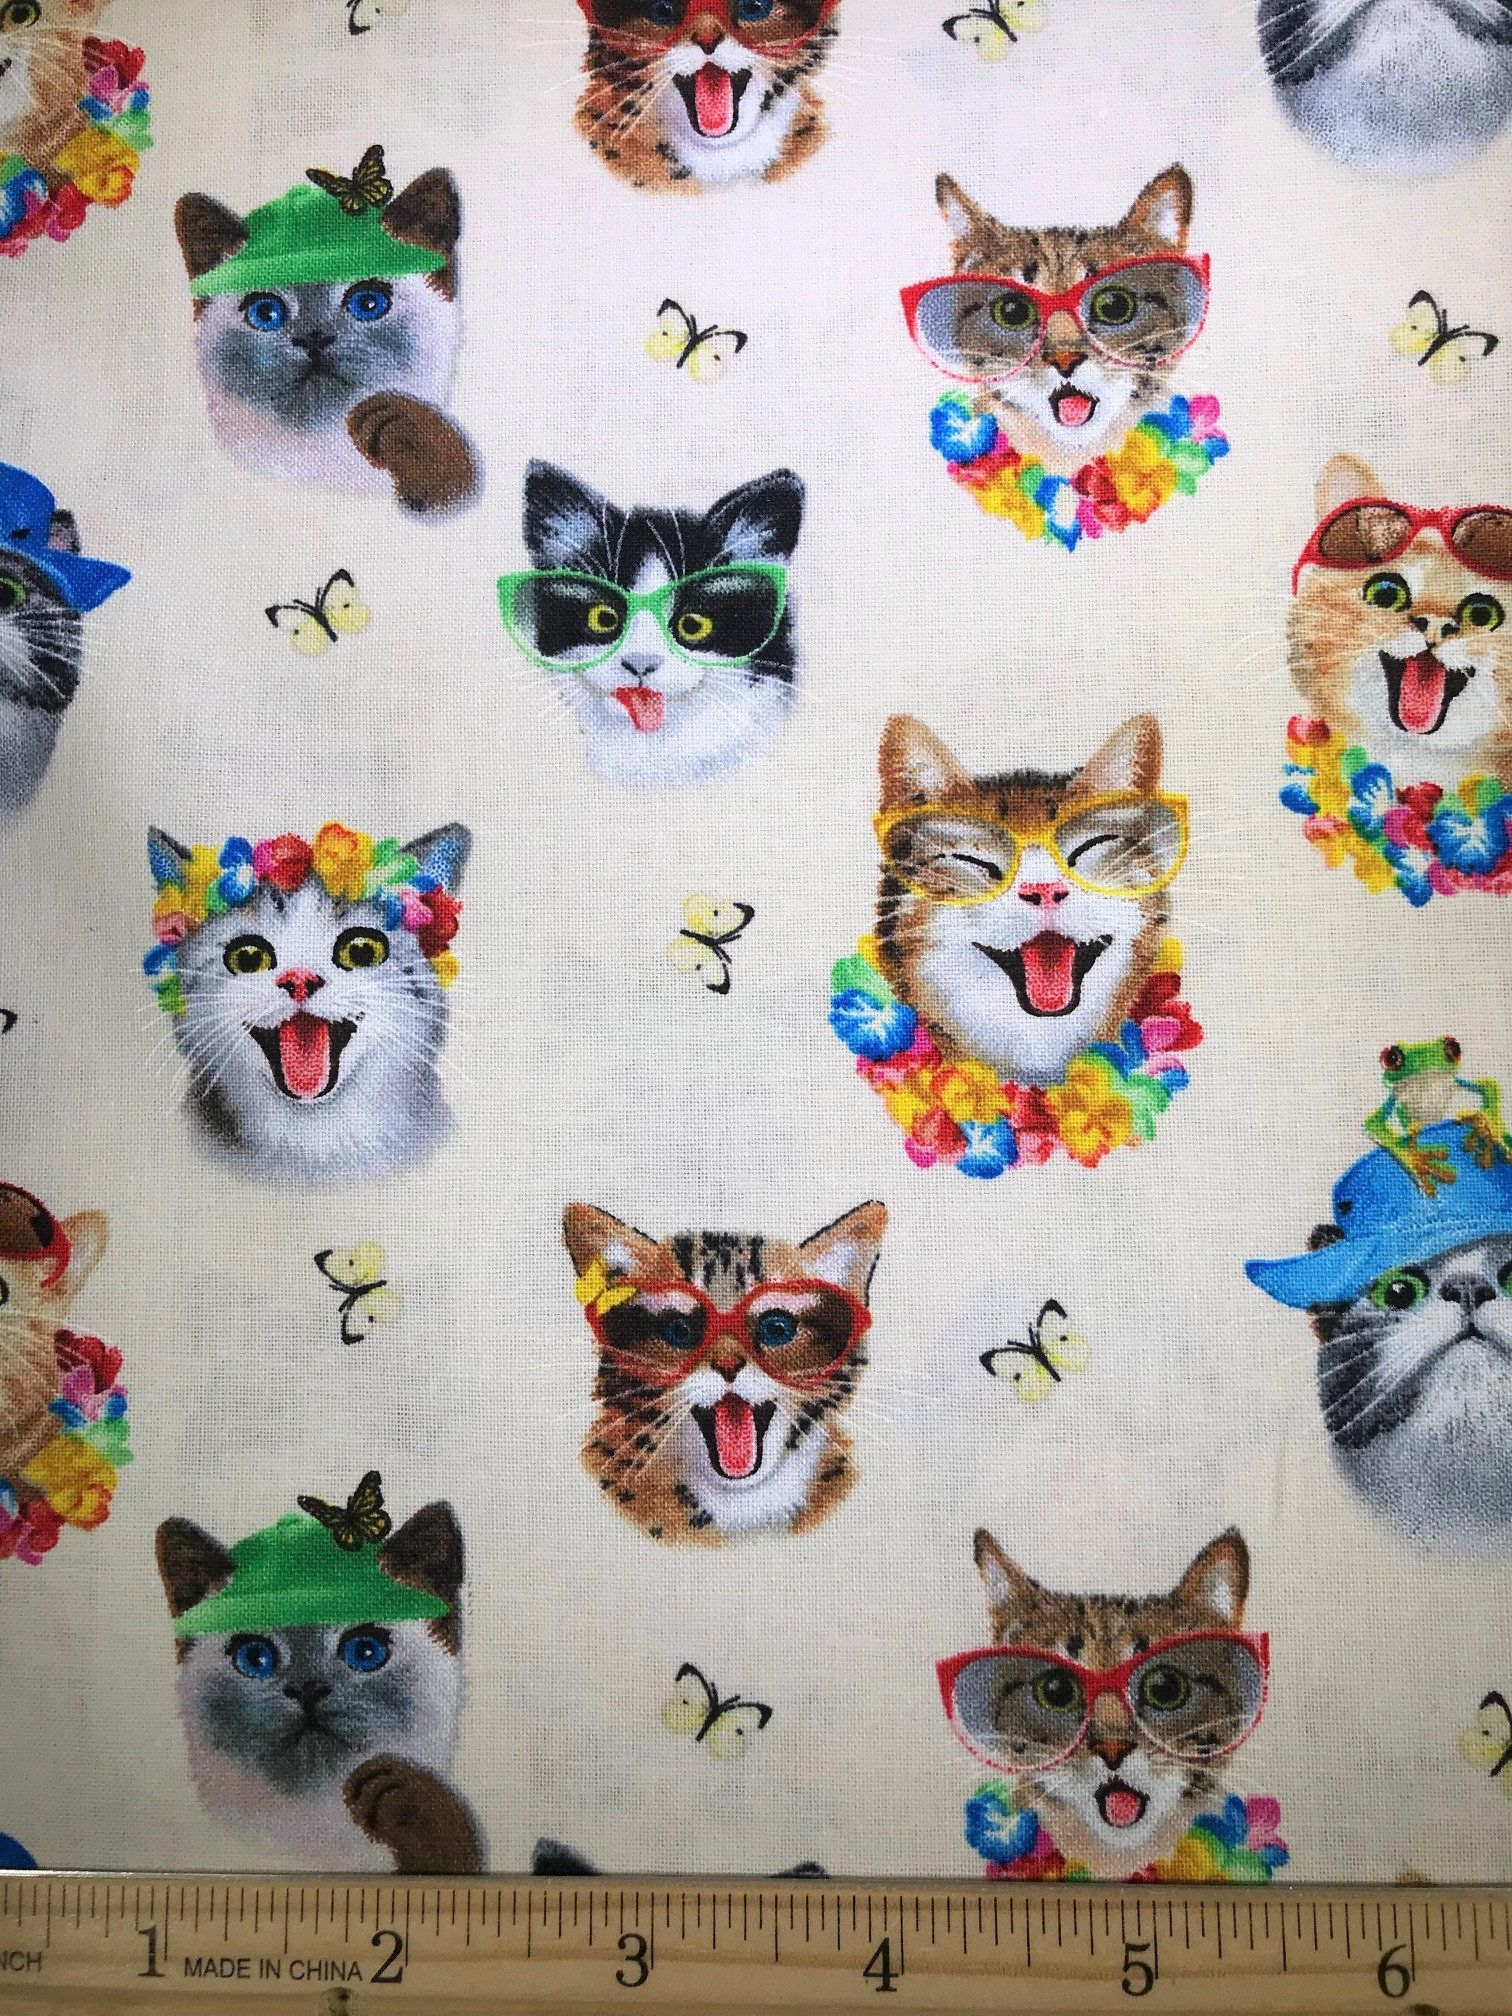 Pin on Cat Fabric